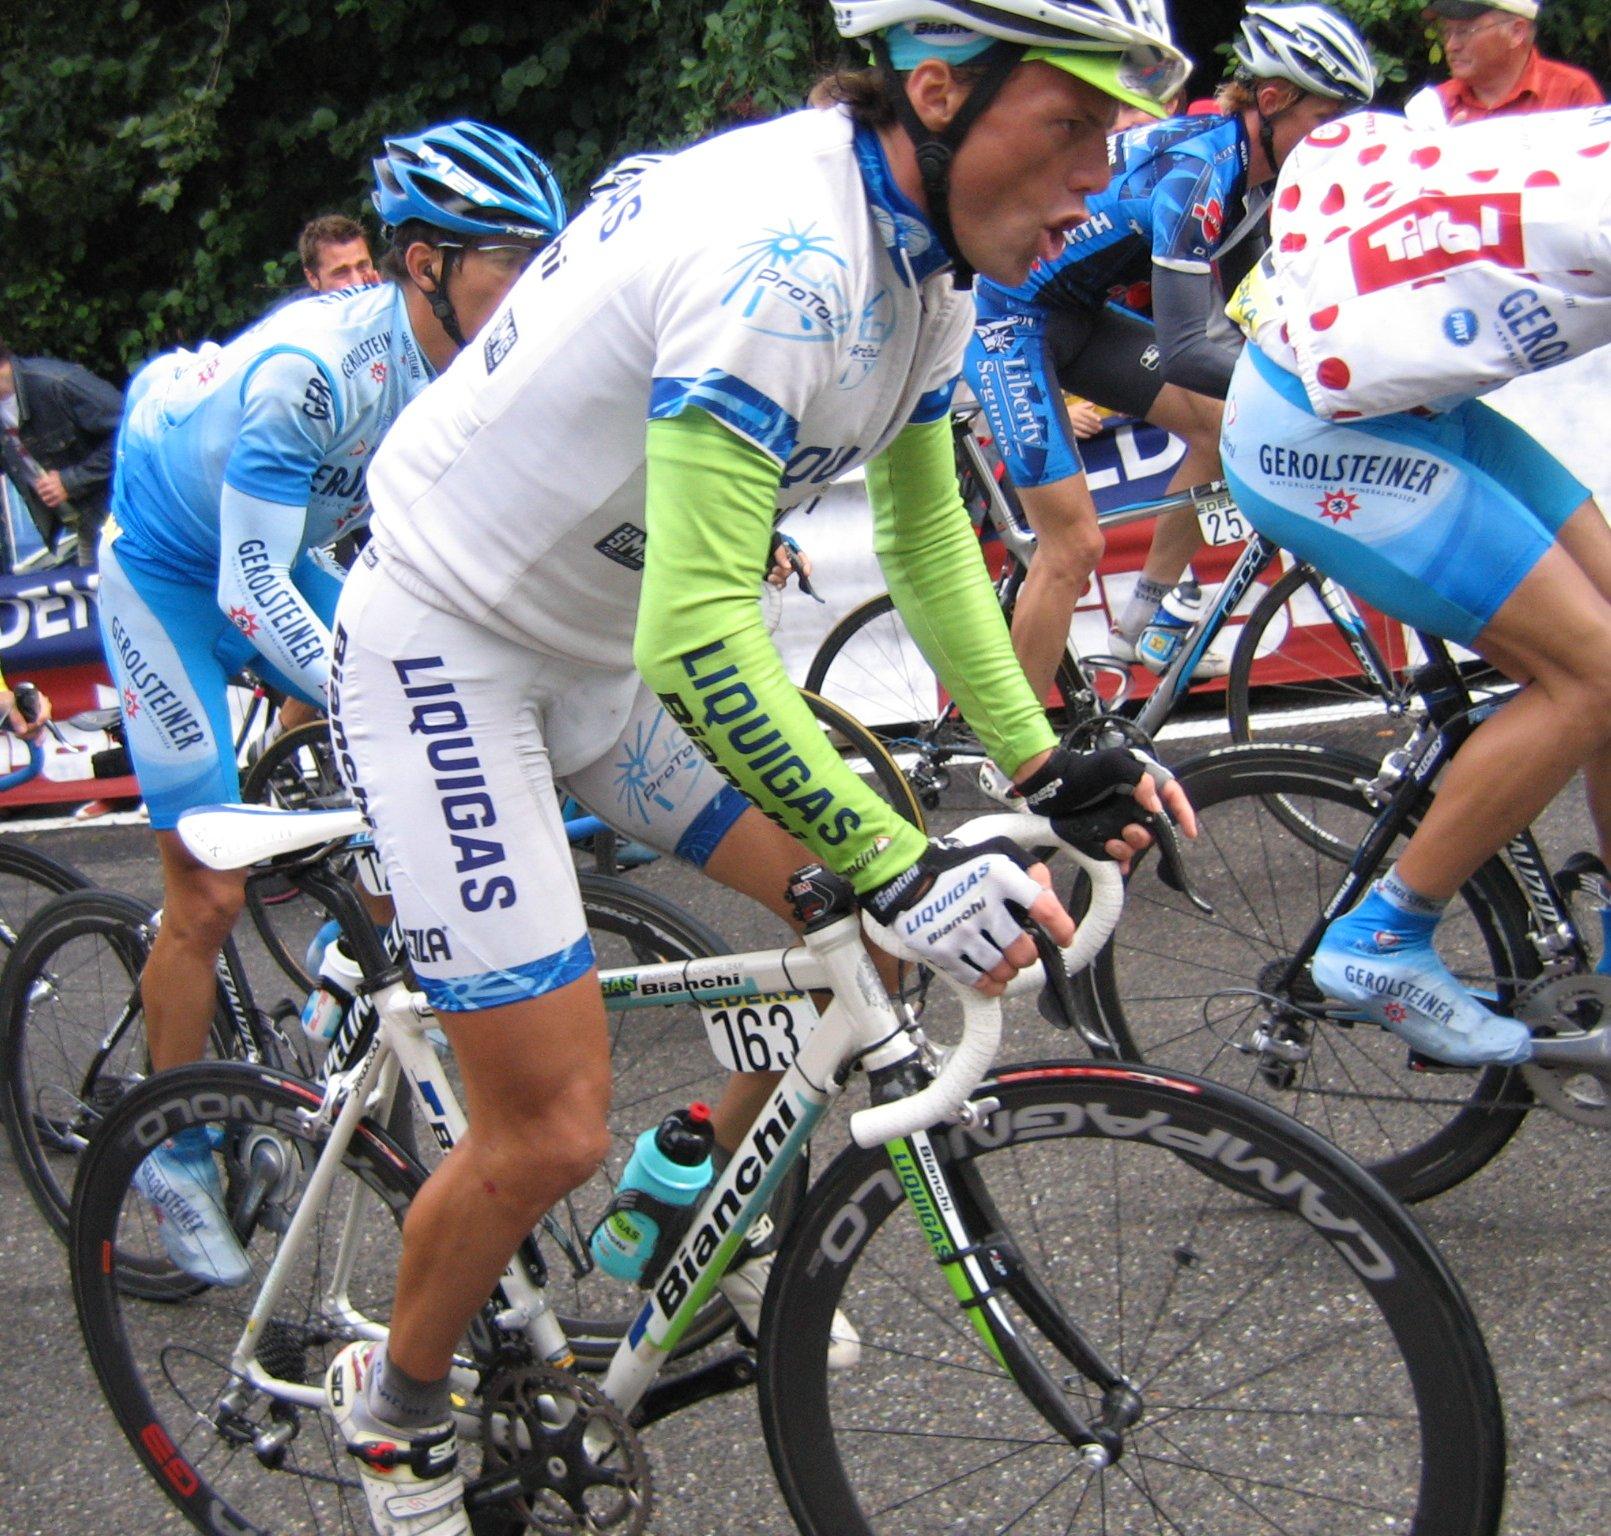 Depiction of UCI ProTour 2005